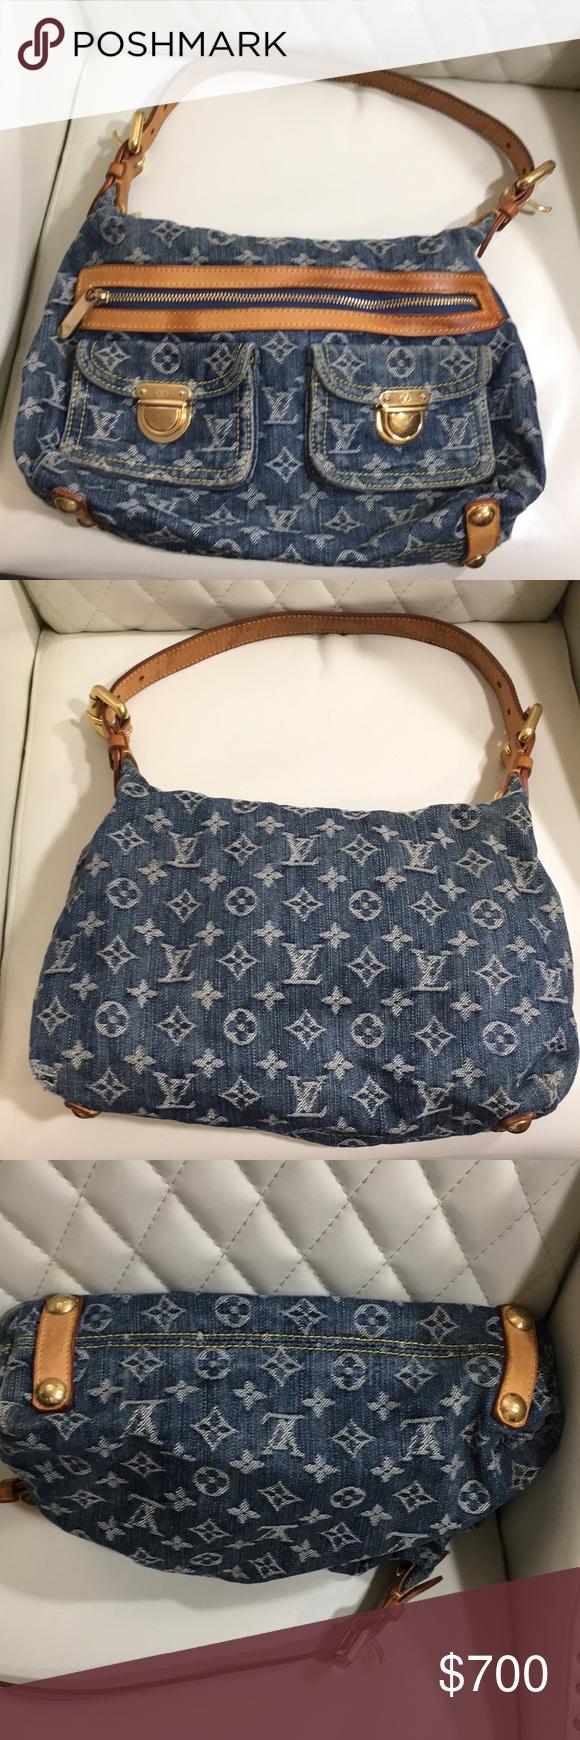 Spotted while shopping on Poshmark  BEST PRICE Louis Vuitton Monogram Baggy  Denim Bag!  poshmark  fashion  shopping  style  Louis Vuitton  Handbags 1c20fa4313d99